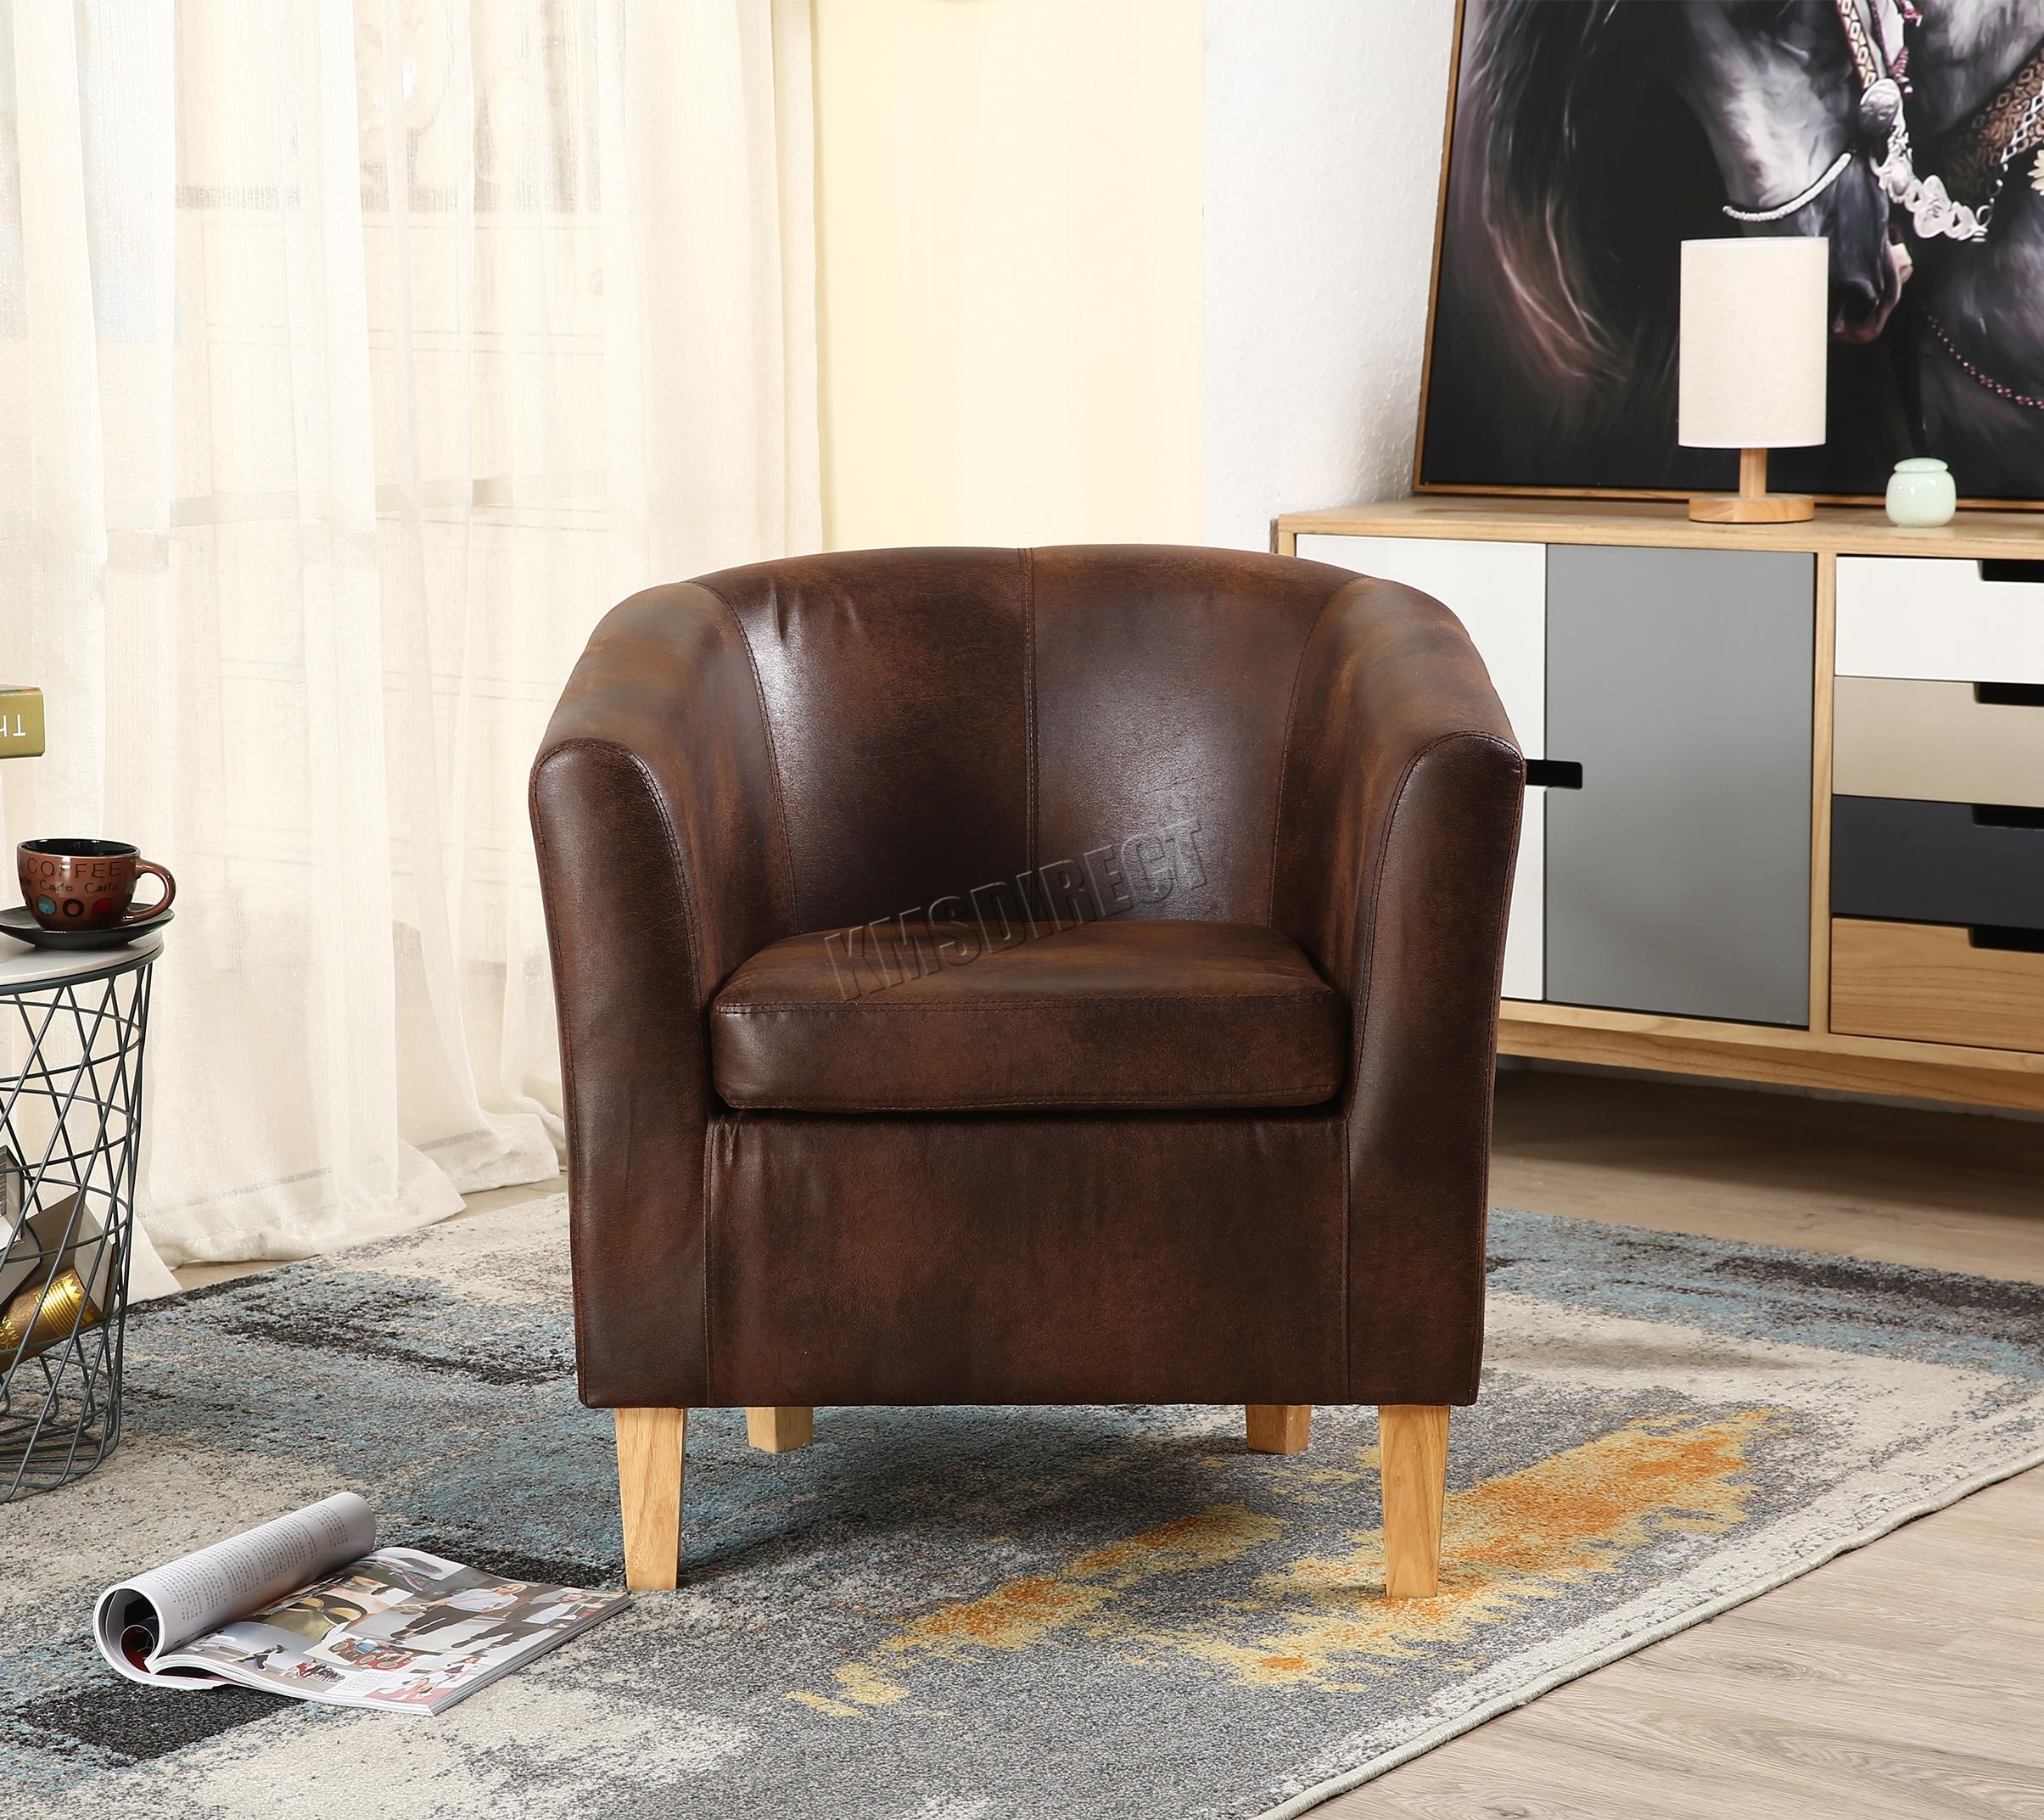 tub chair brown leather pink westwood vintage faux armchair